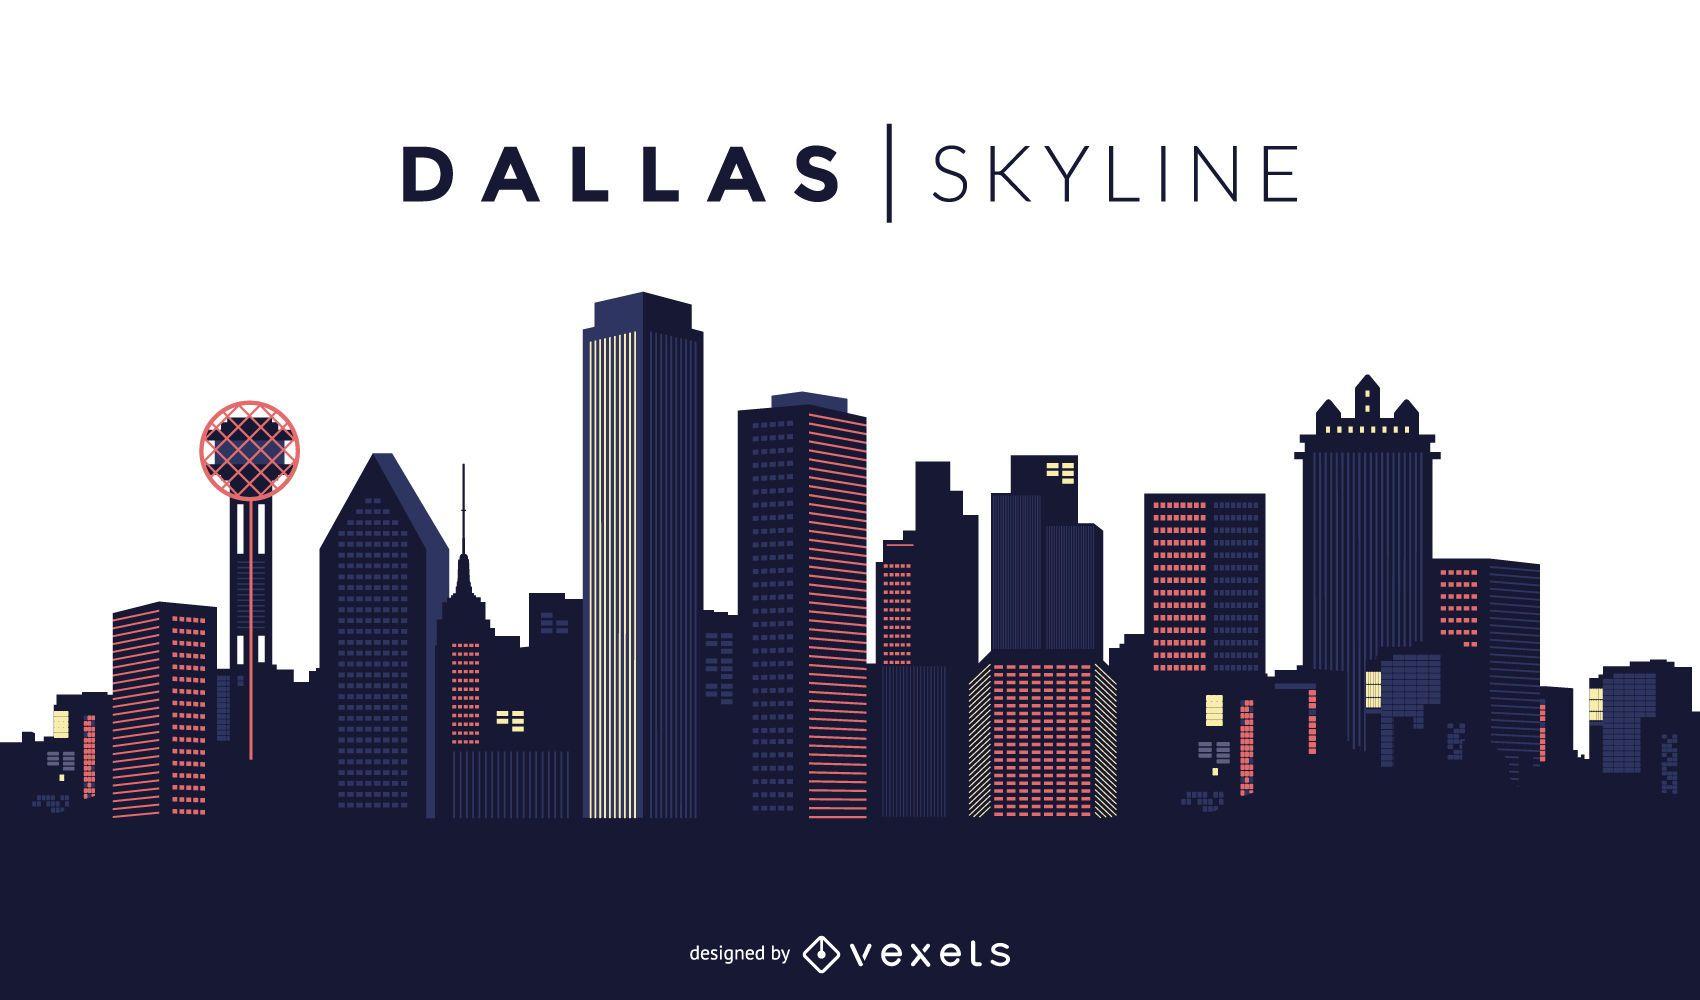 Dallas skyline design